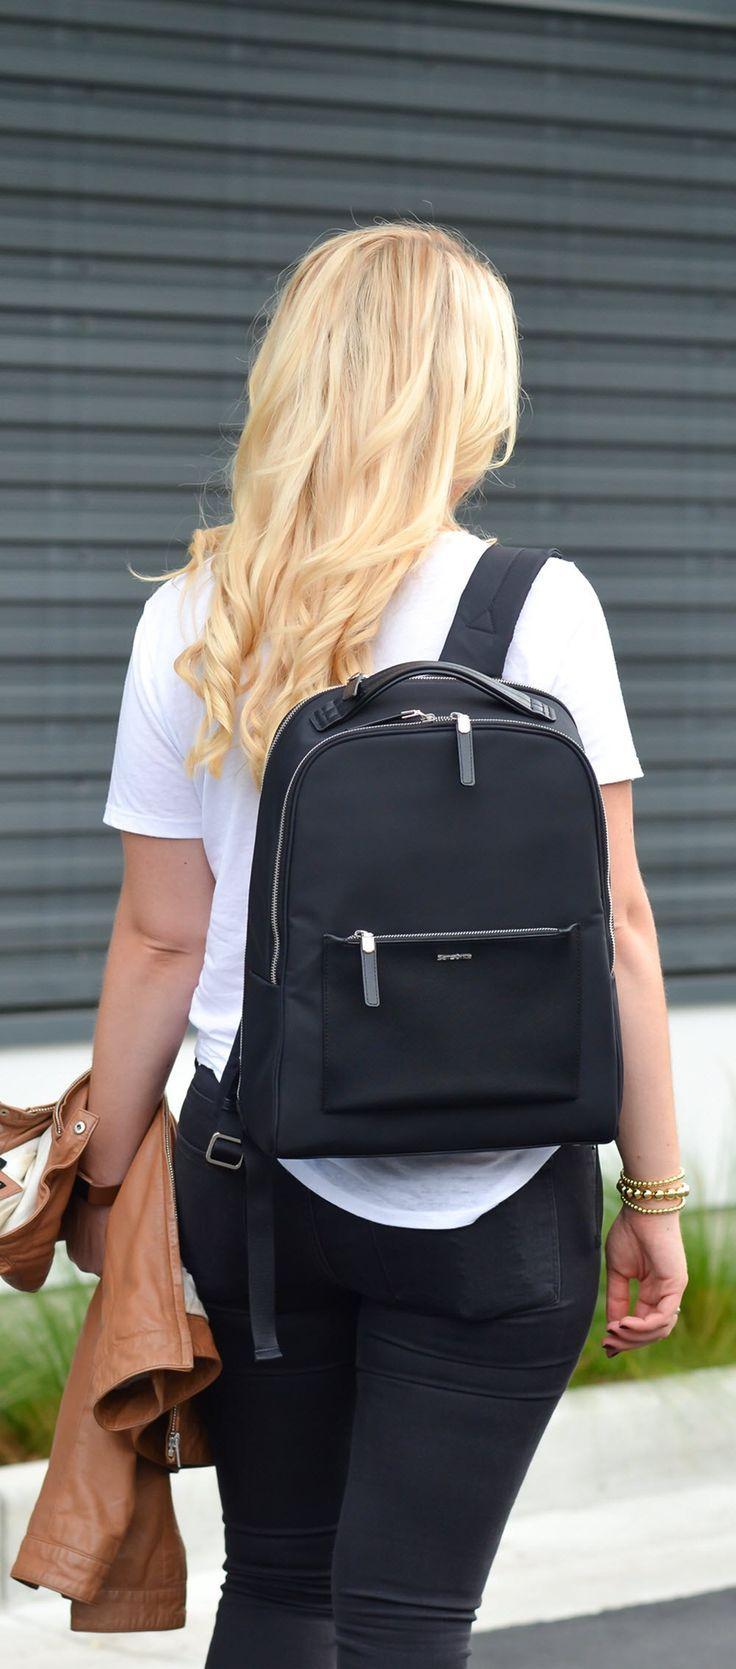 1f1f4e9f1a Best Travel Work Bags for Stylish Women. Chic Work Laptop Backpack -  Samsonite Zalia Backpack Review